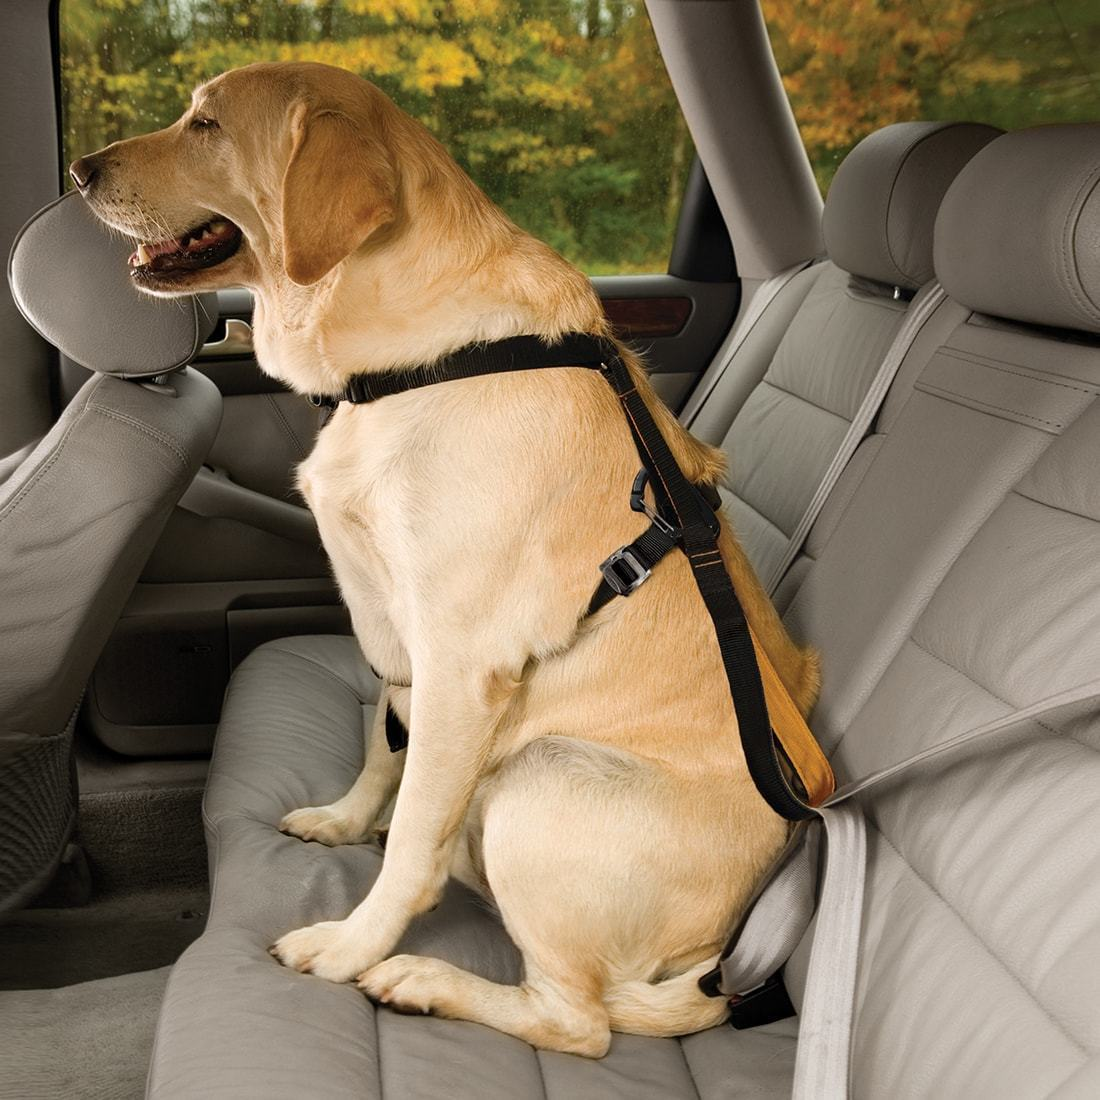 kg-dog-car-safety-harness-1.jpg